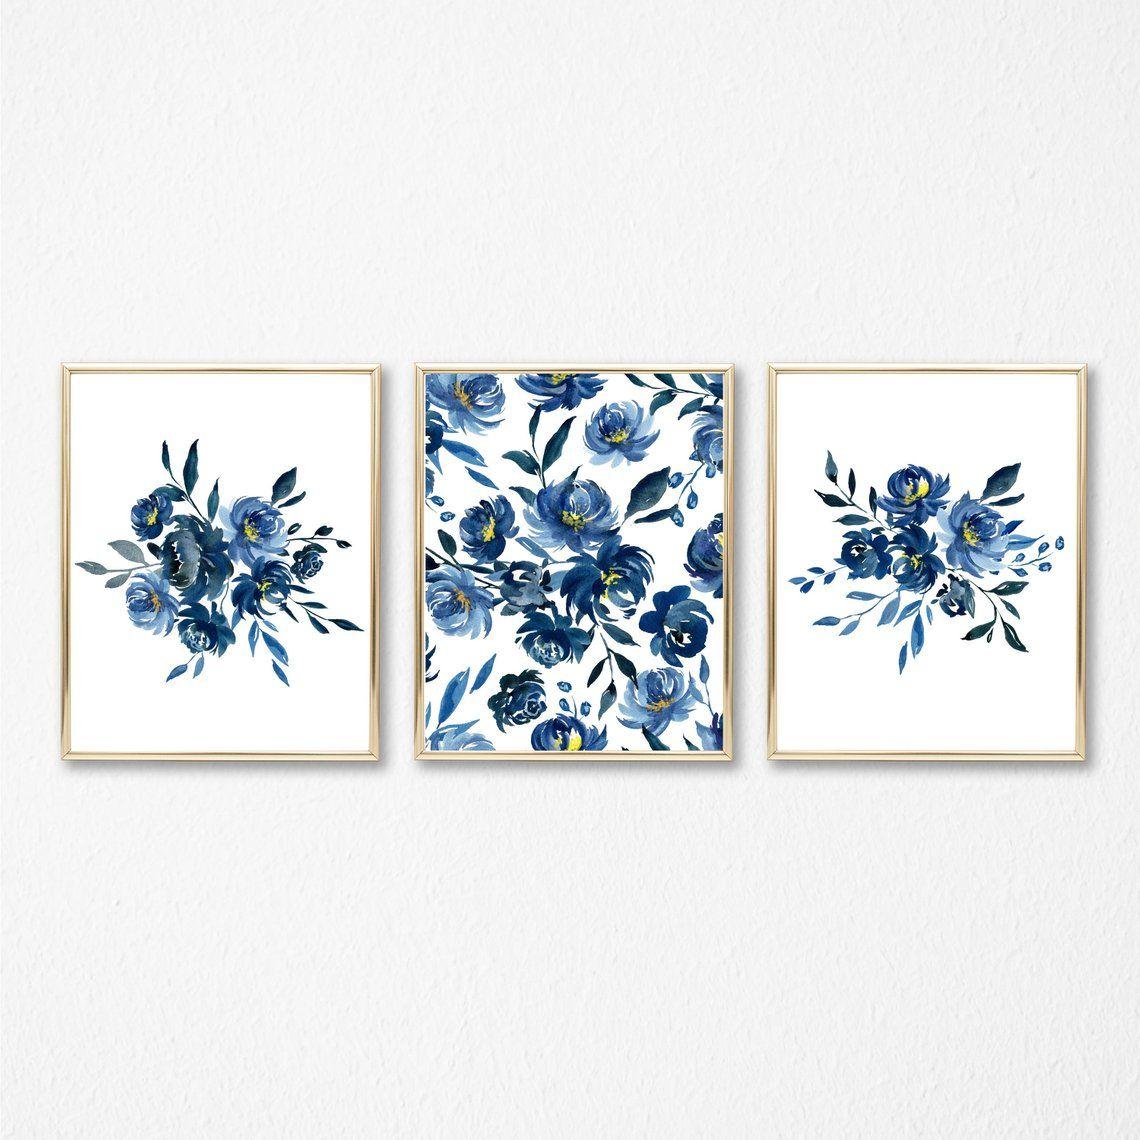 Winter Blue Floral 11x14 Set Of 3 Wall Art Instant Etsy In 2021 Floral Wall Art Framed Floral Prints Printable Wall Art